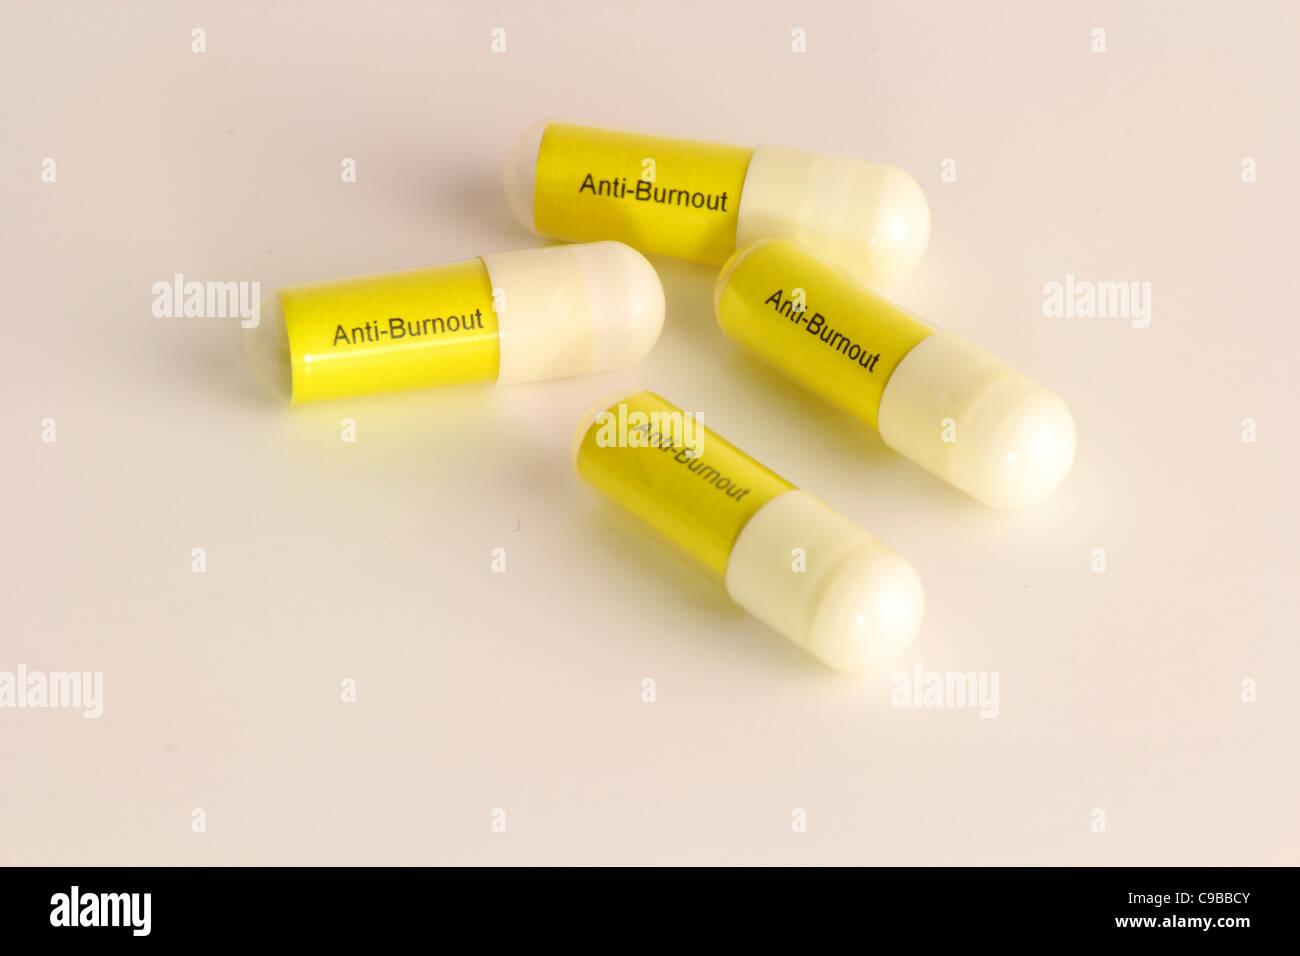 Pills Against Burnout - Stock Image